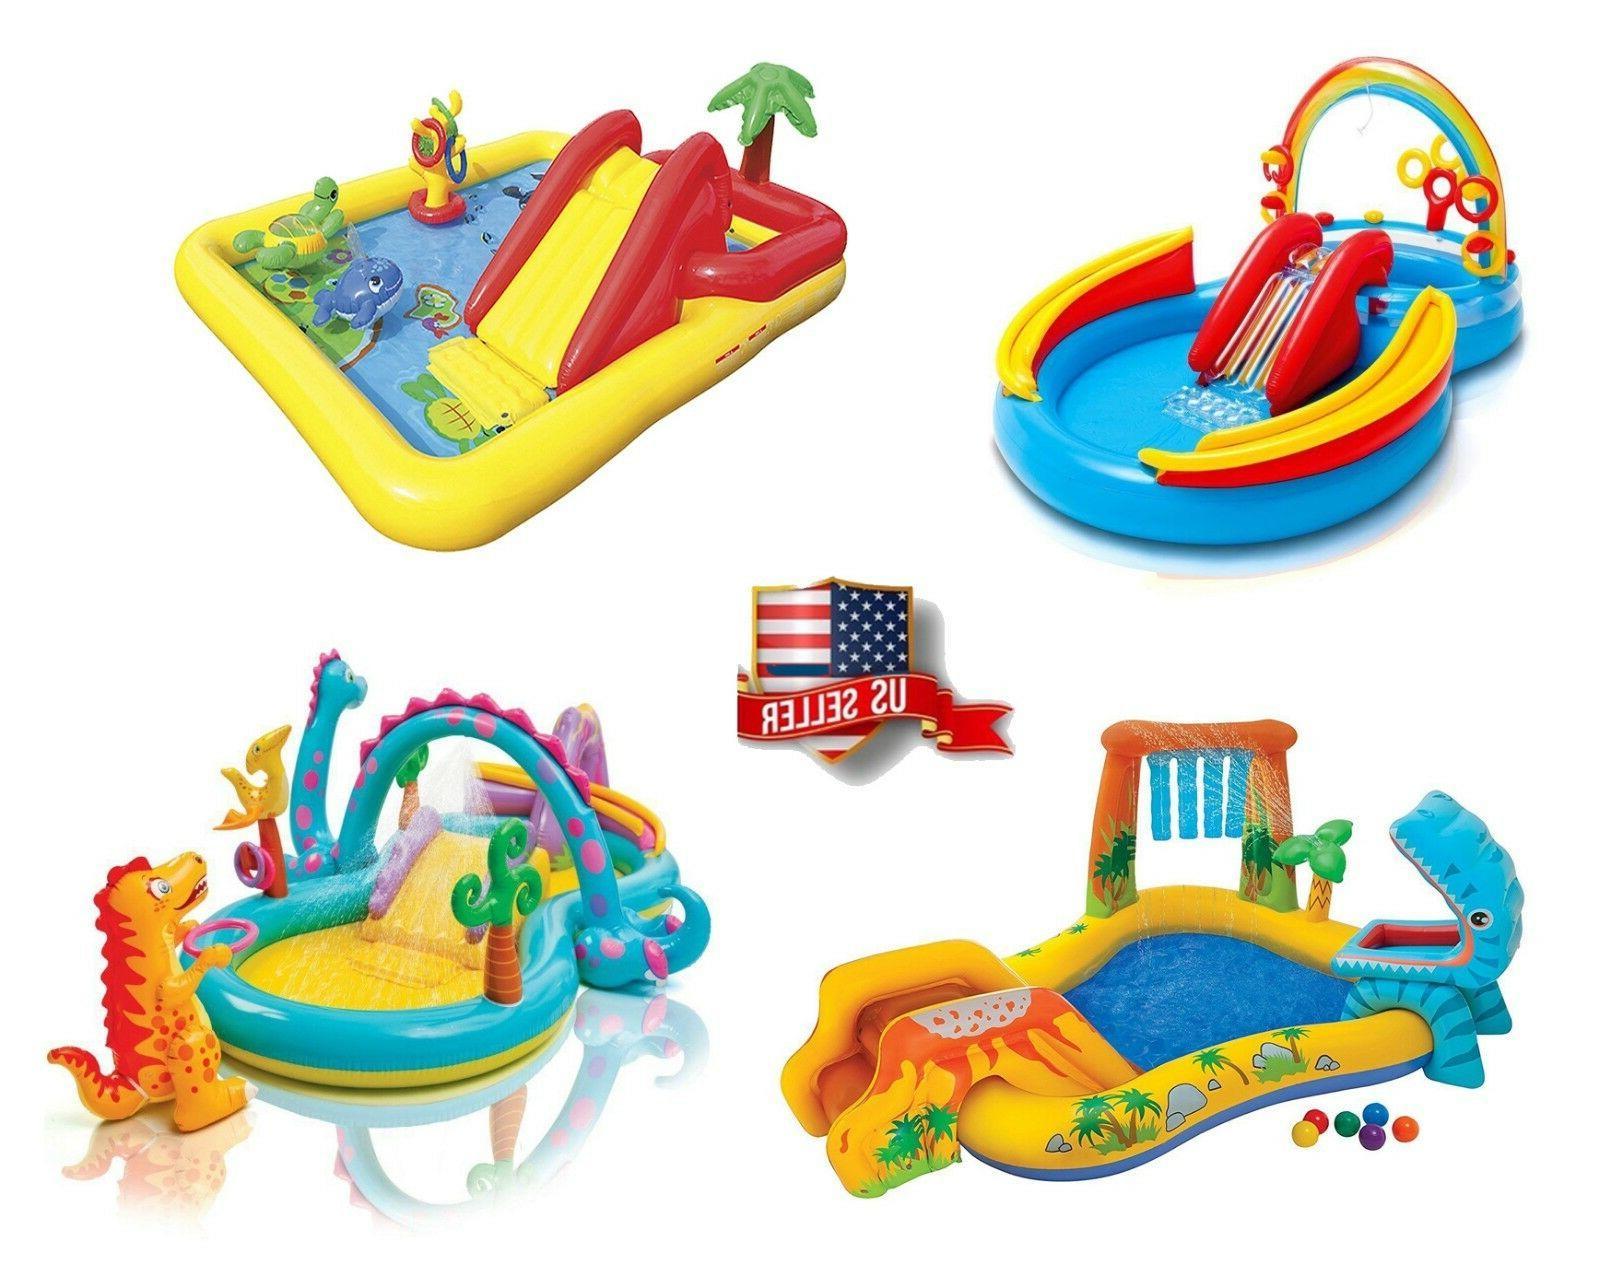 Intex Inflatable Pool Water Play Rainbow Ring Center Slide B